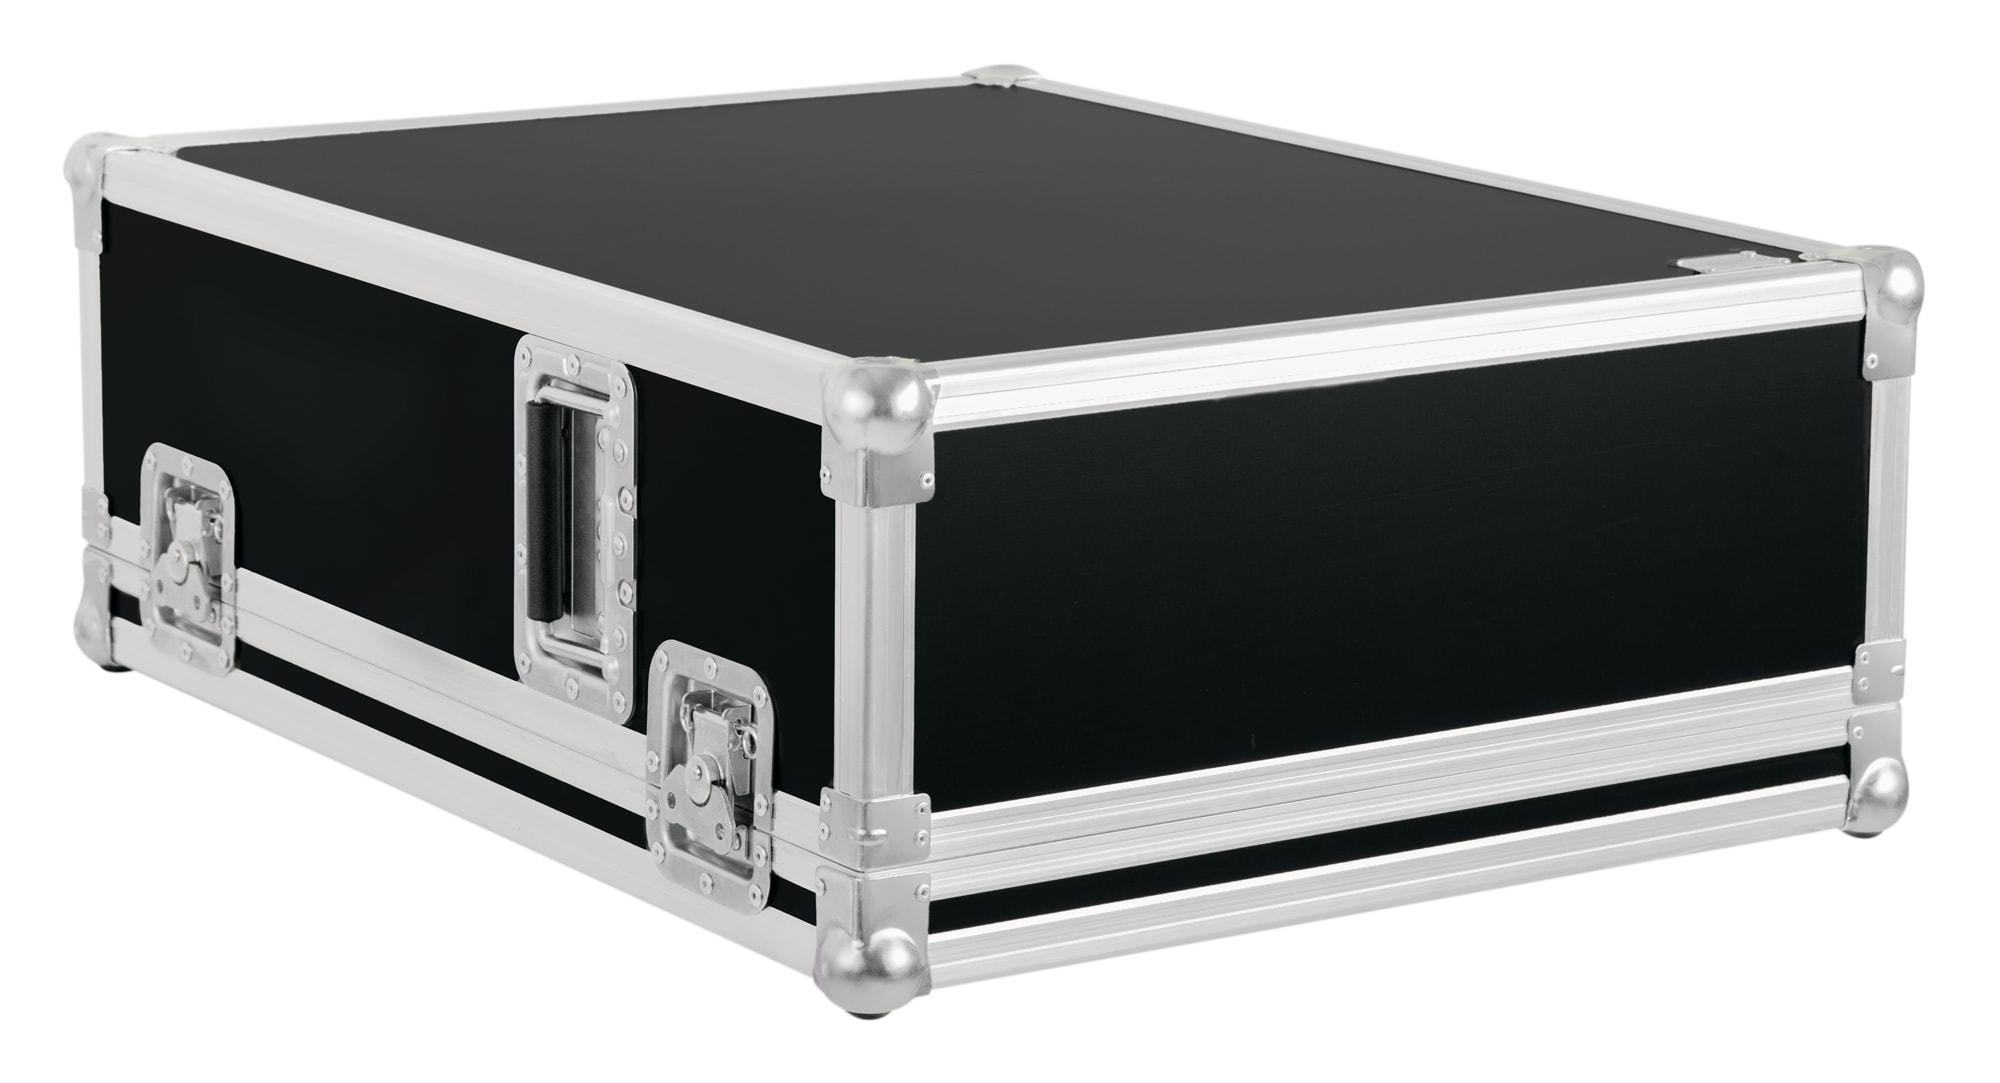 Studiozubehoer - Gäng Case Yamaha TF 1 PerforLine Kabelraum - Onlineshop Musikhaus Kirstein